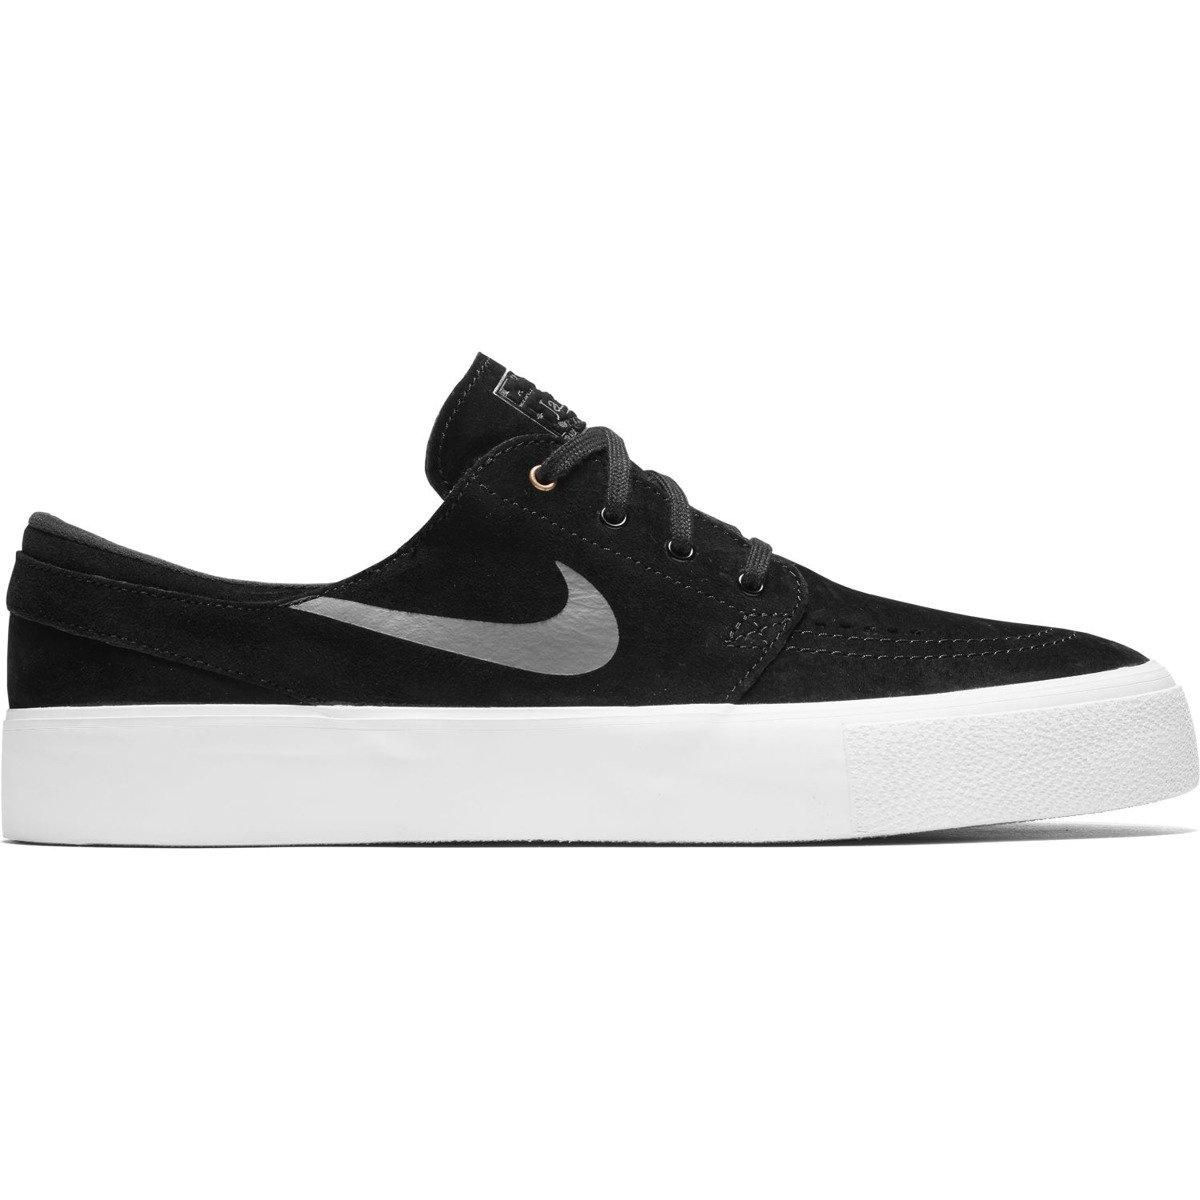 851adadece4c Miniramp Skateshop buty nike sb zoom stefan janoski ht black dark grey-metallic  gold-white